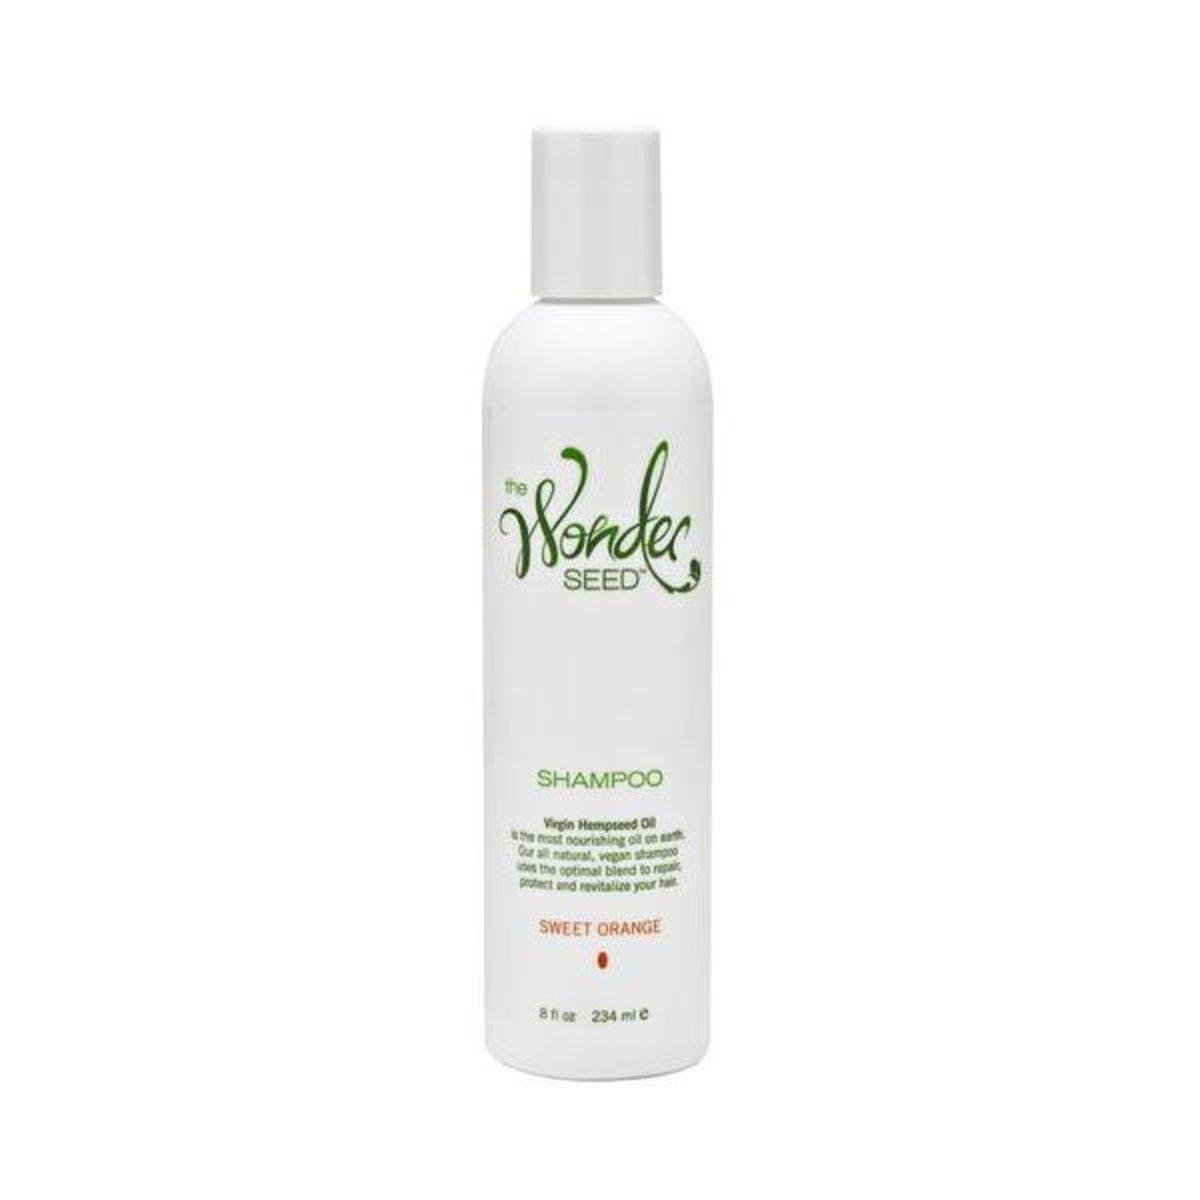 the_wonder_seed_hemp_shampoo